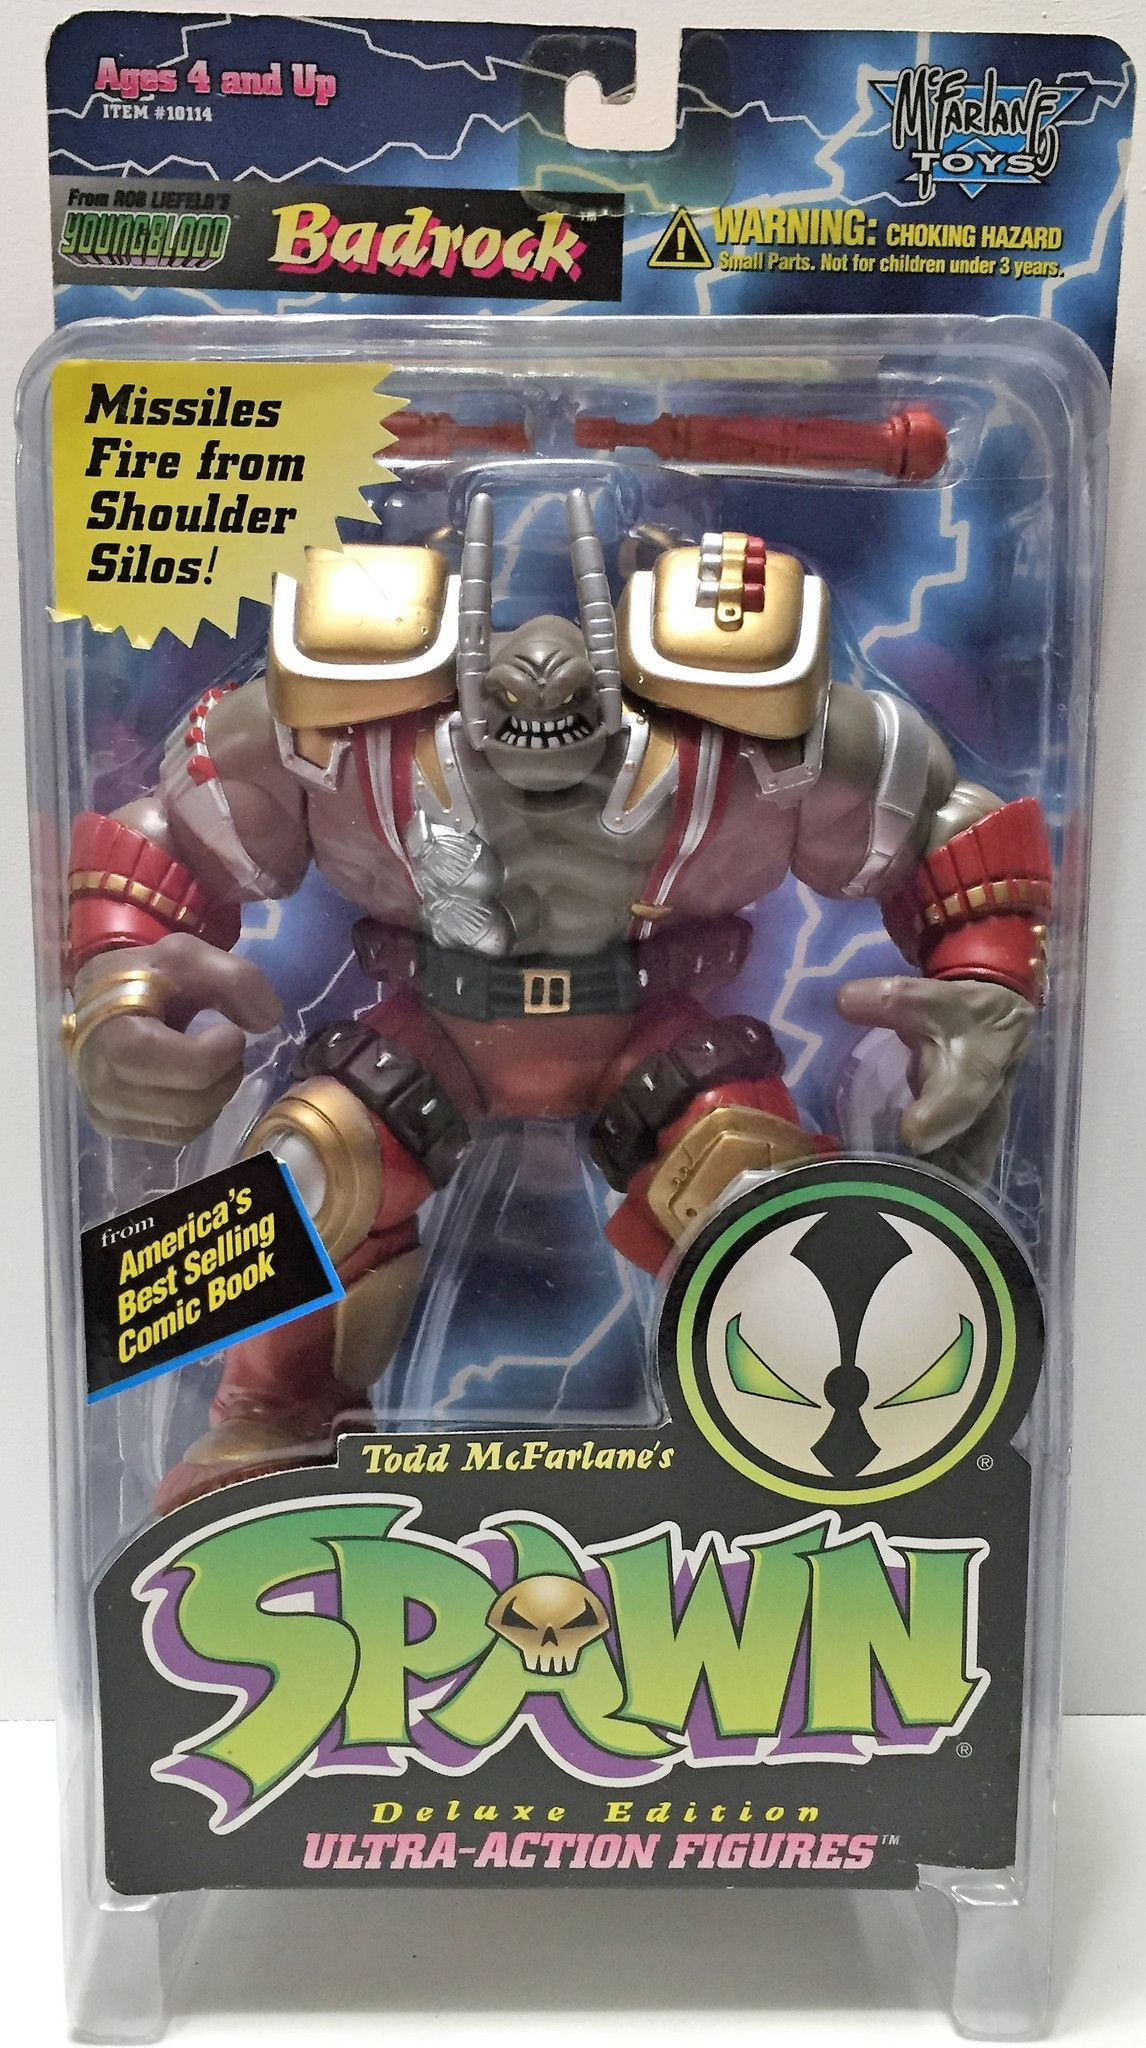 TAS033756) - 1995 McFarlane Toys Spawn Deluxe Ultra-Action